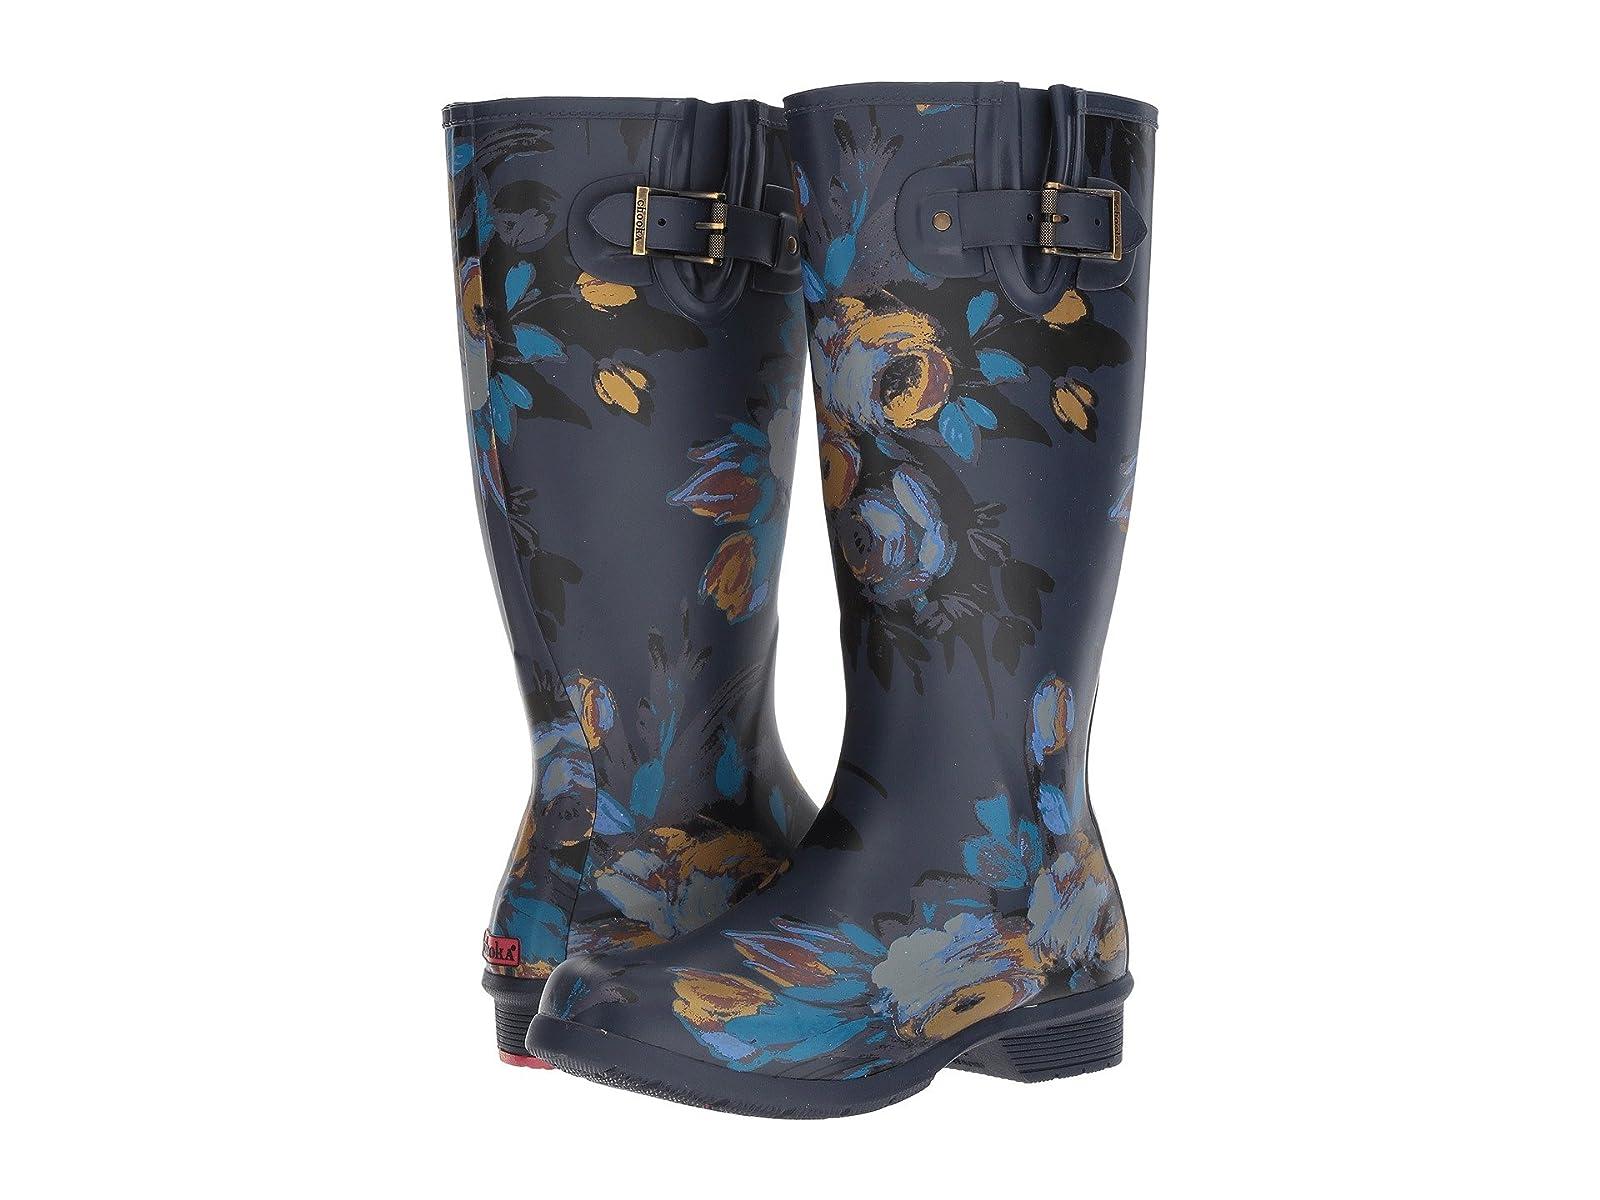 Chooka Nina Tall BootSelling fashionable and eye-catching shoes